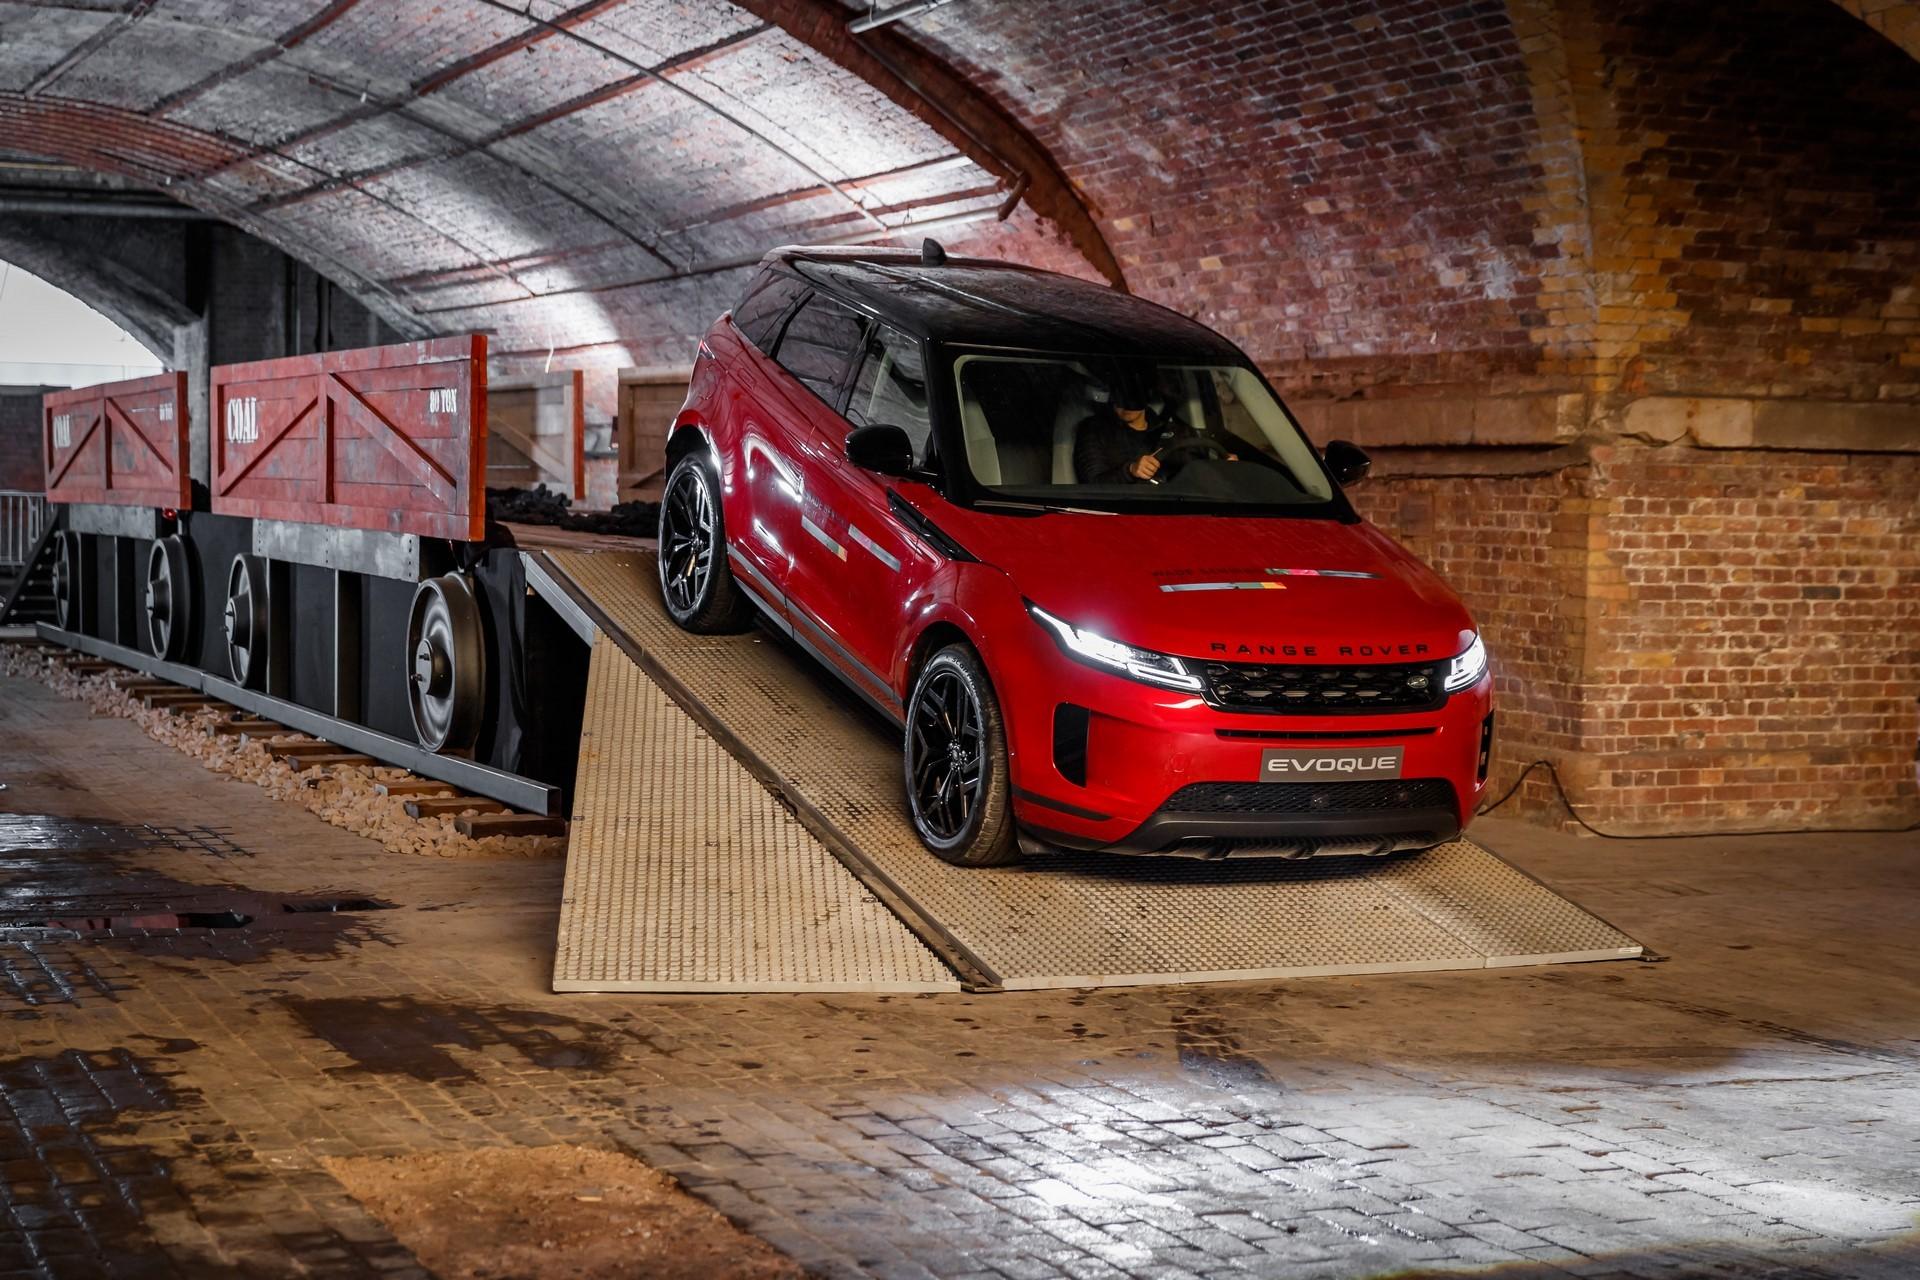 Range Rover Evoque 2019 (119)